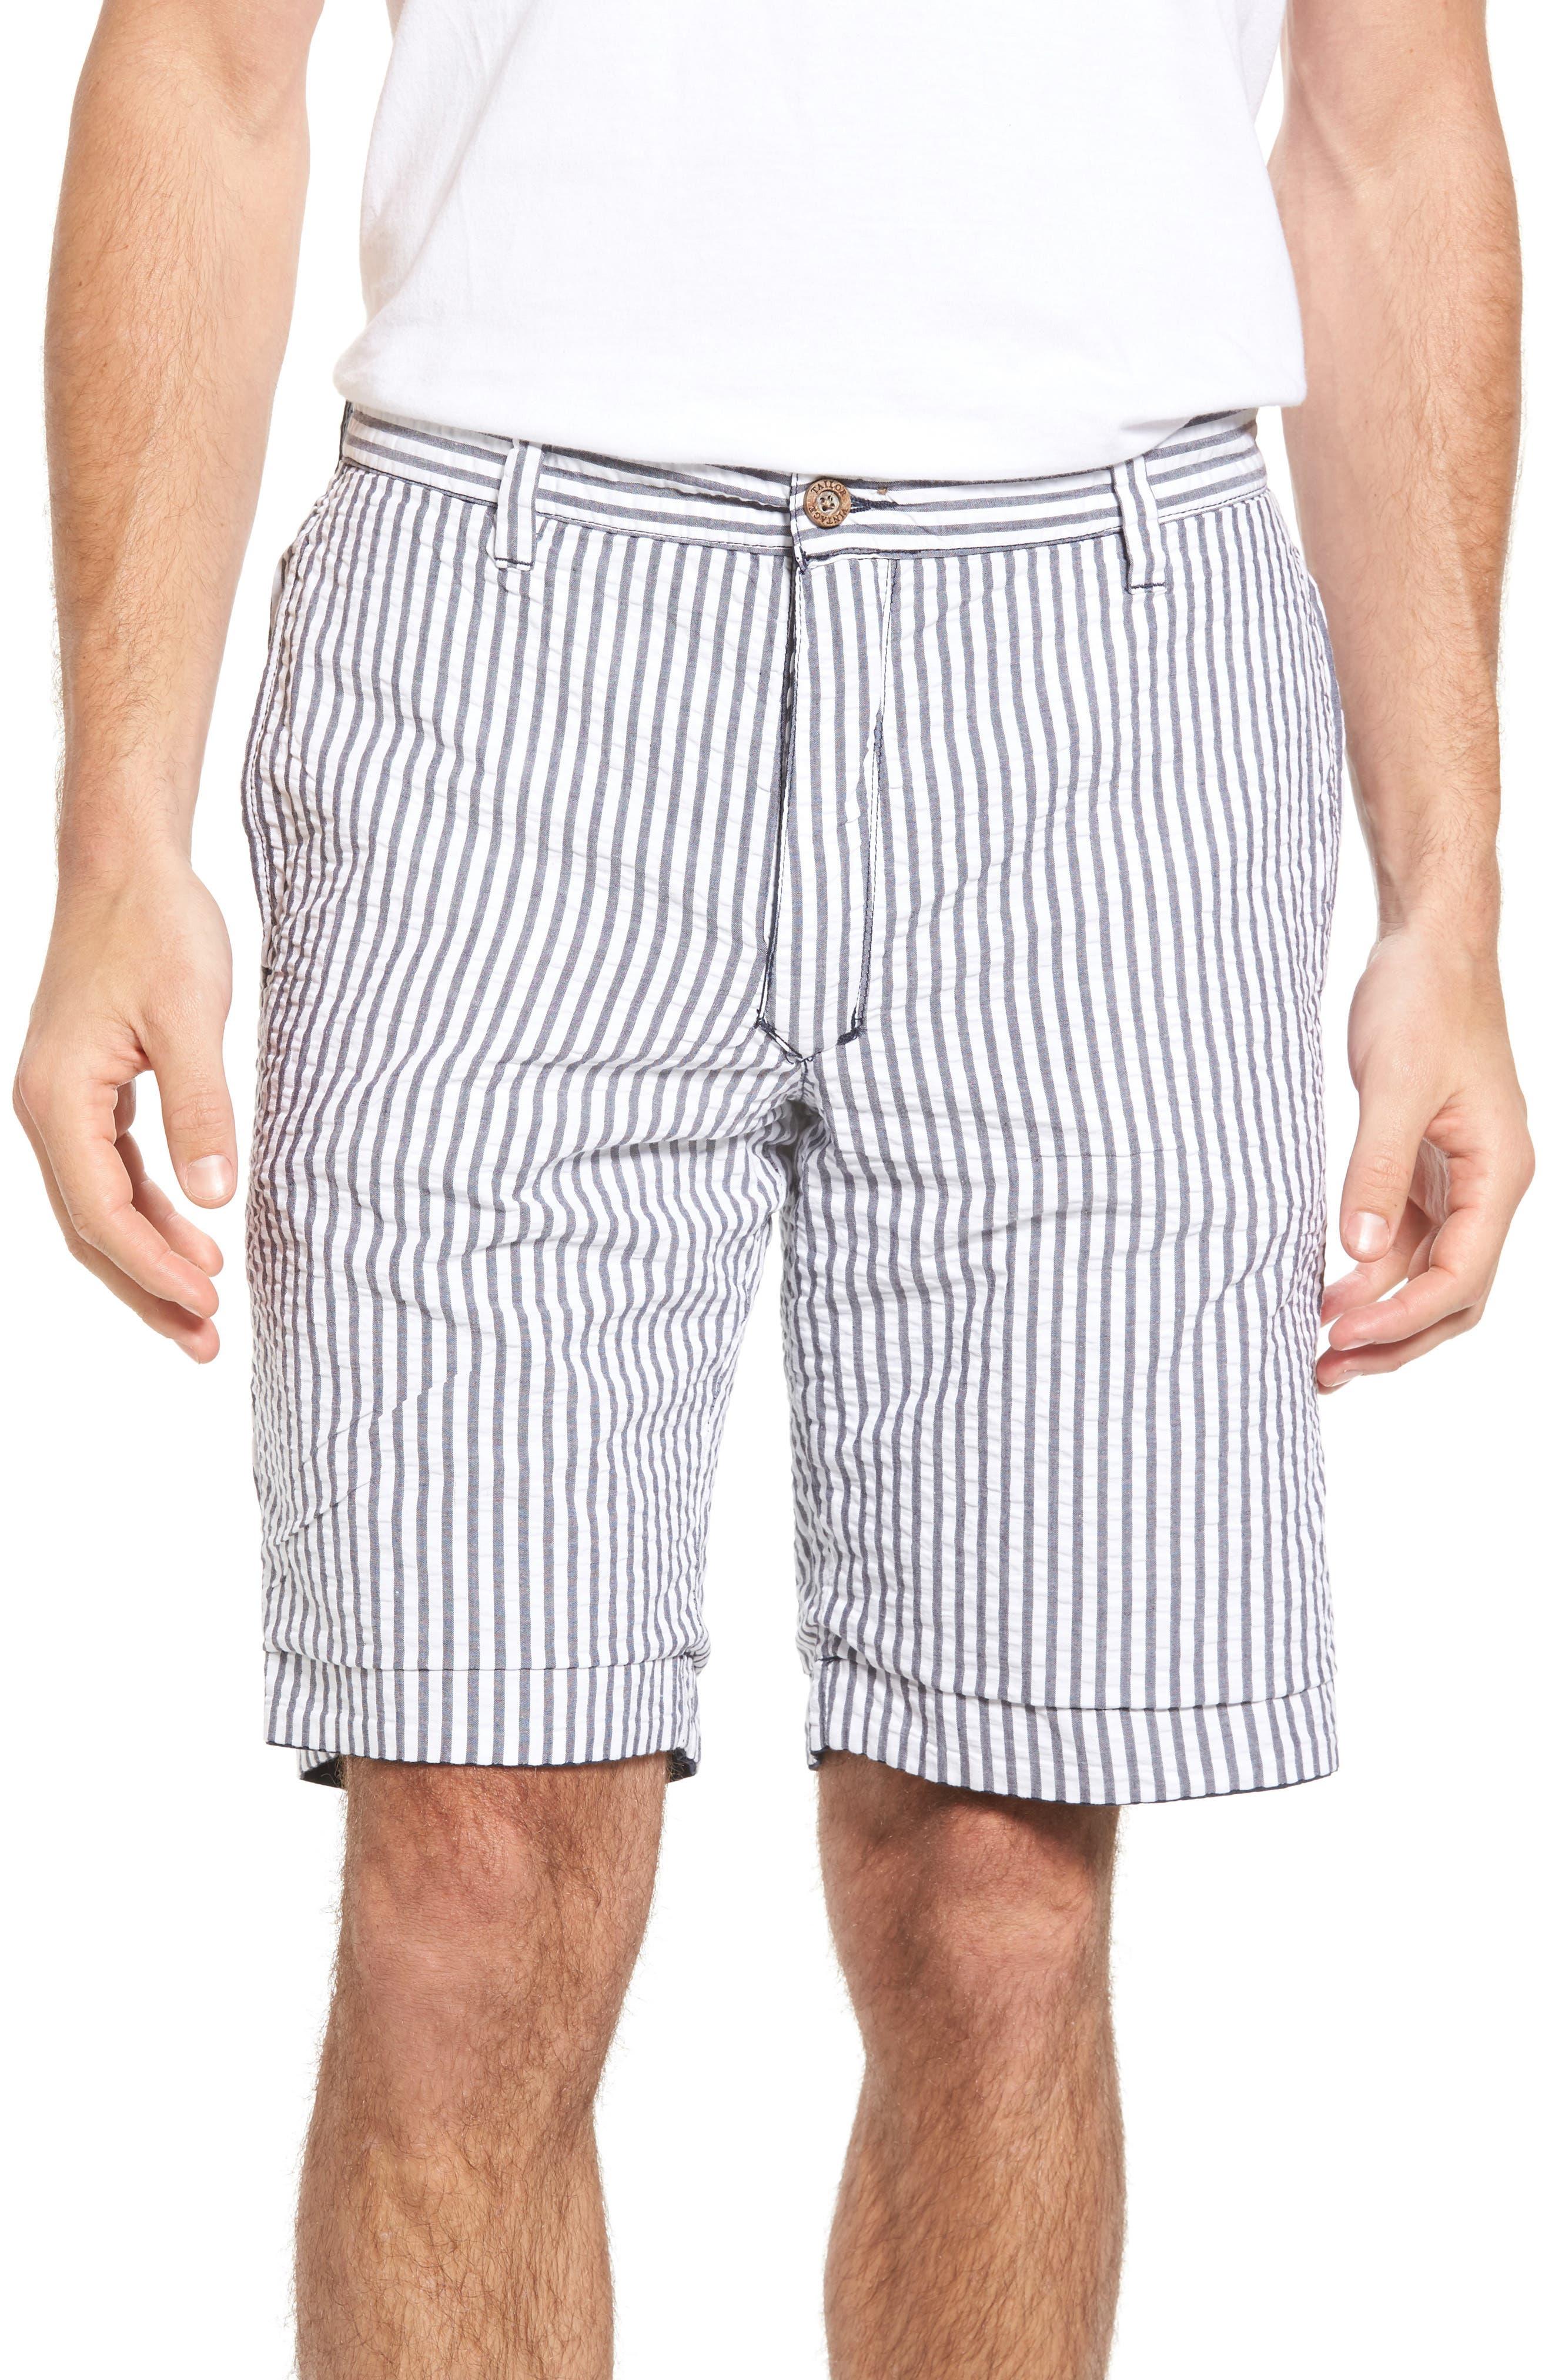 Reversible Walking Shorts,                             Alternate thumbnail 4, color,                             Navy/ Seersucker/ Navy